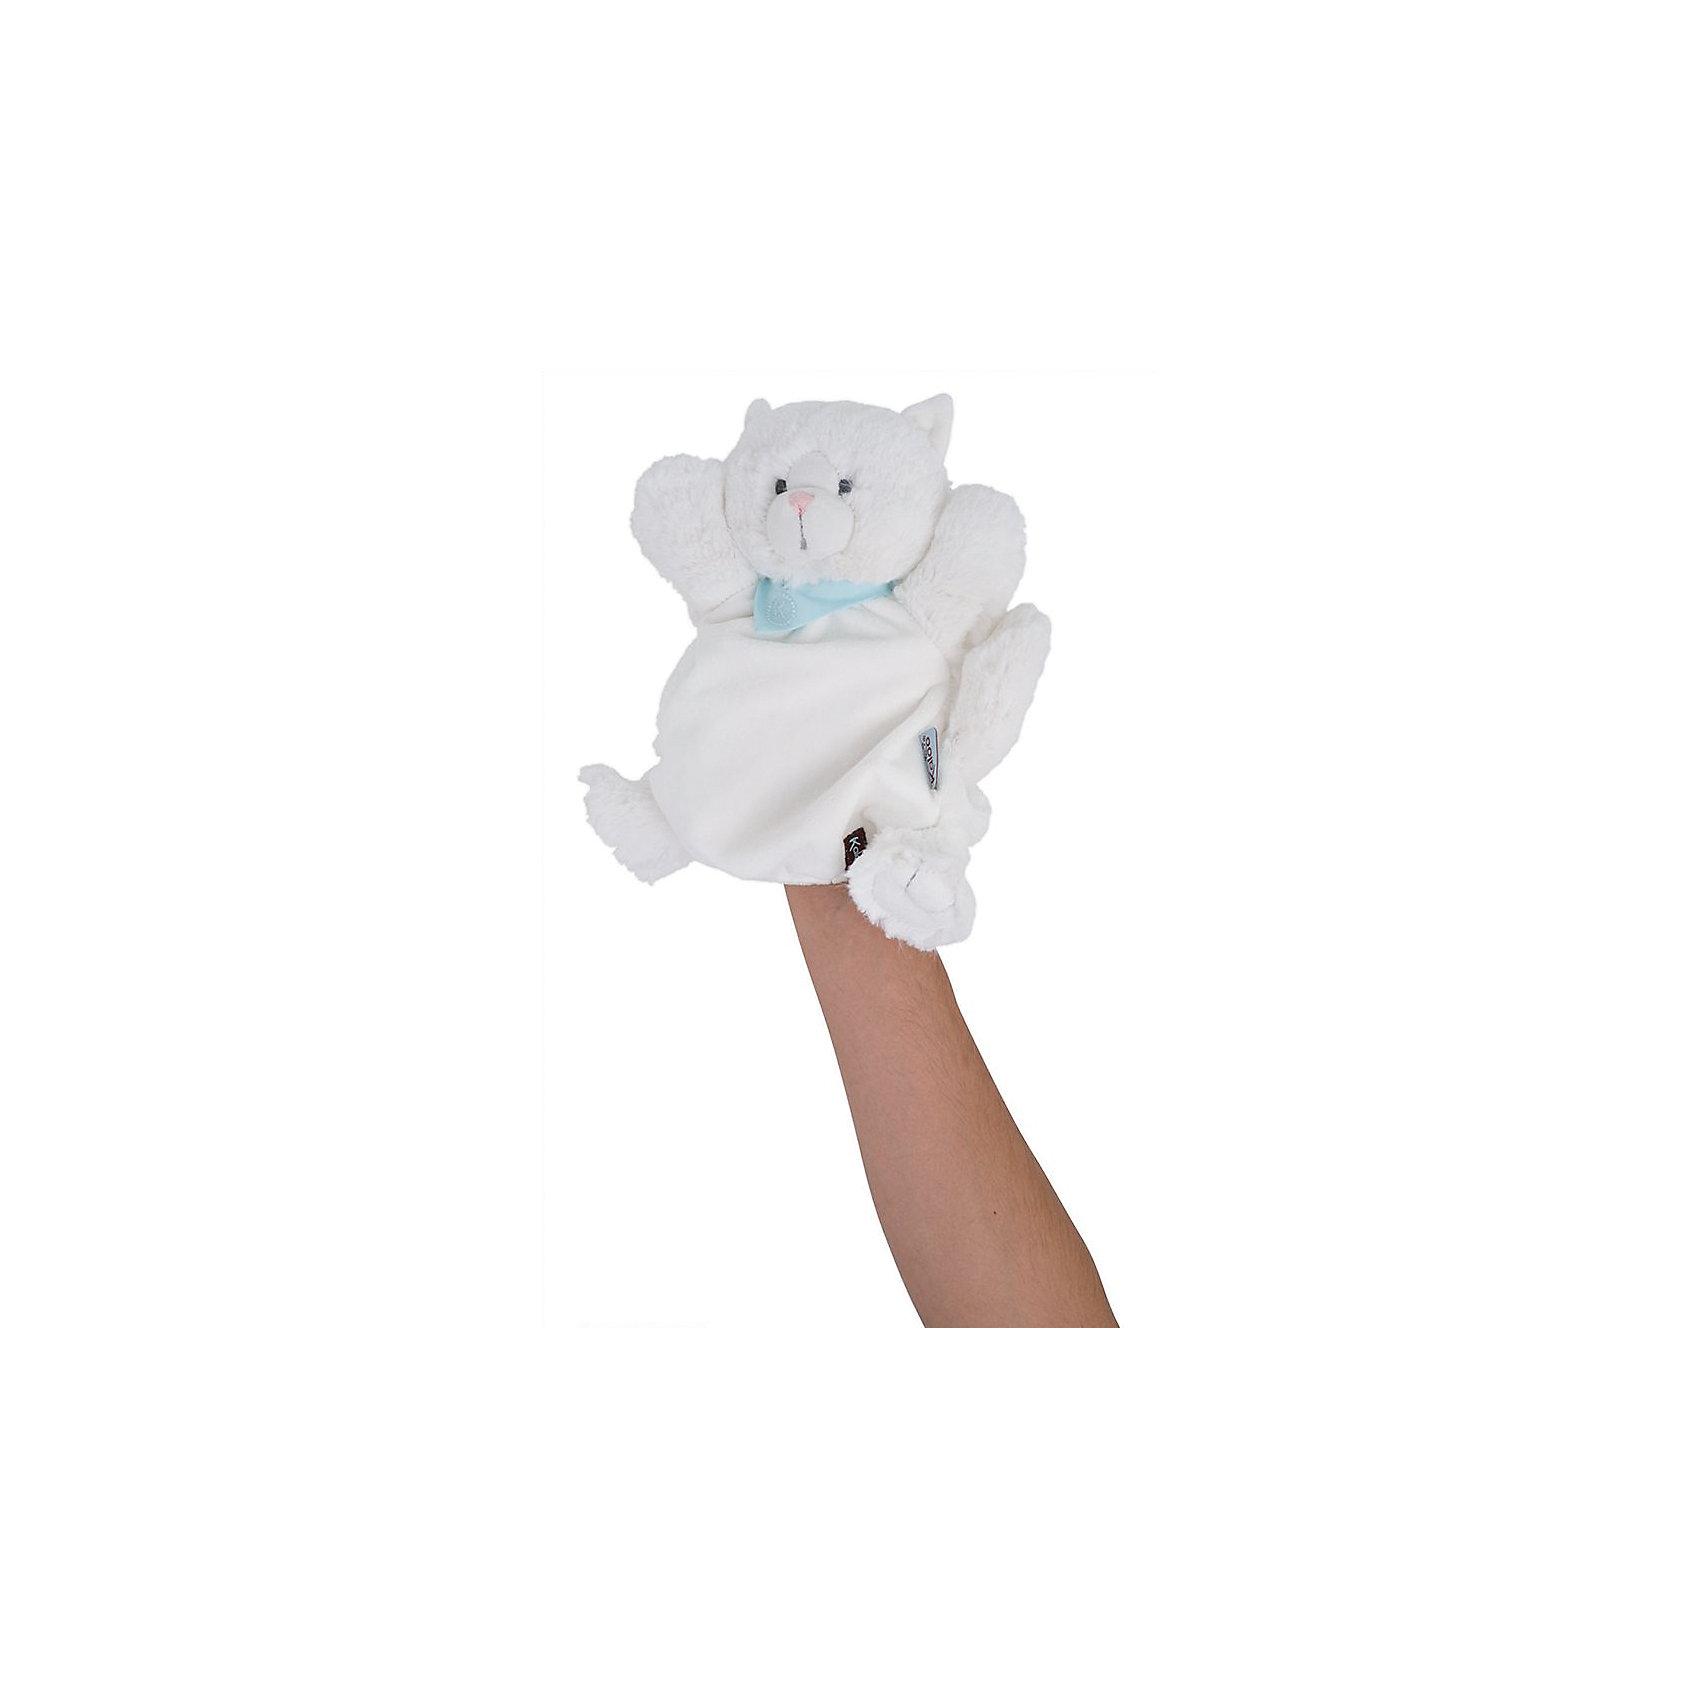 Kaloo Котик комфортер игрушка на руку, коллекция Друзья, Kaloo kaloo котик комфортер игрушка на руку коллекция друзья kaloo